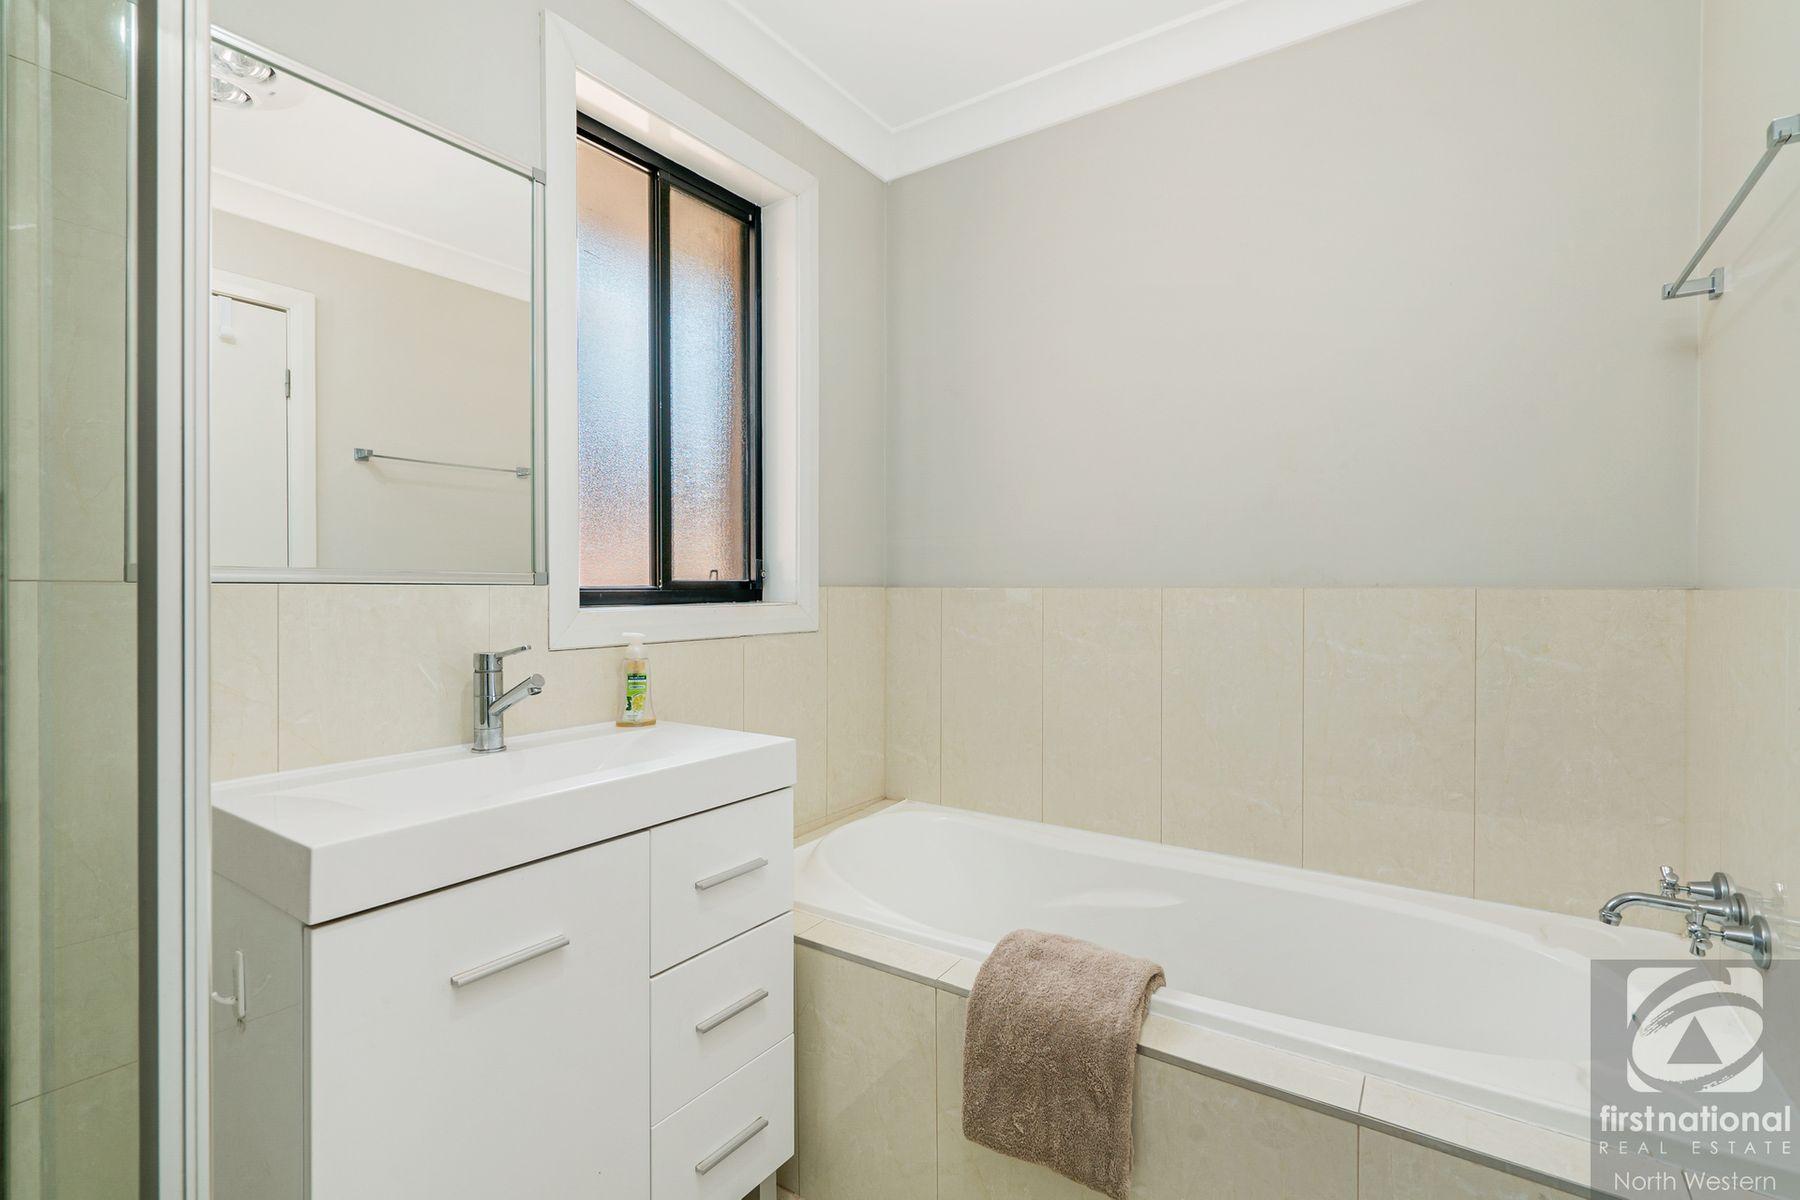 14/37 Shedworth Street, Marayong, NSW 2148